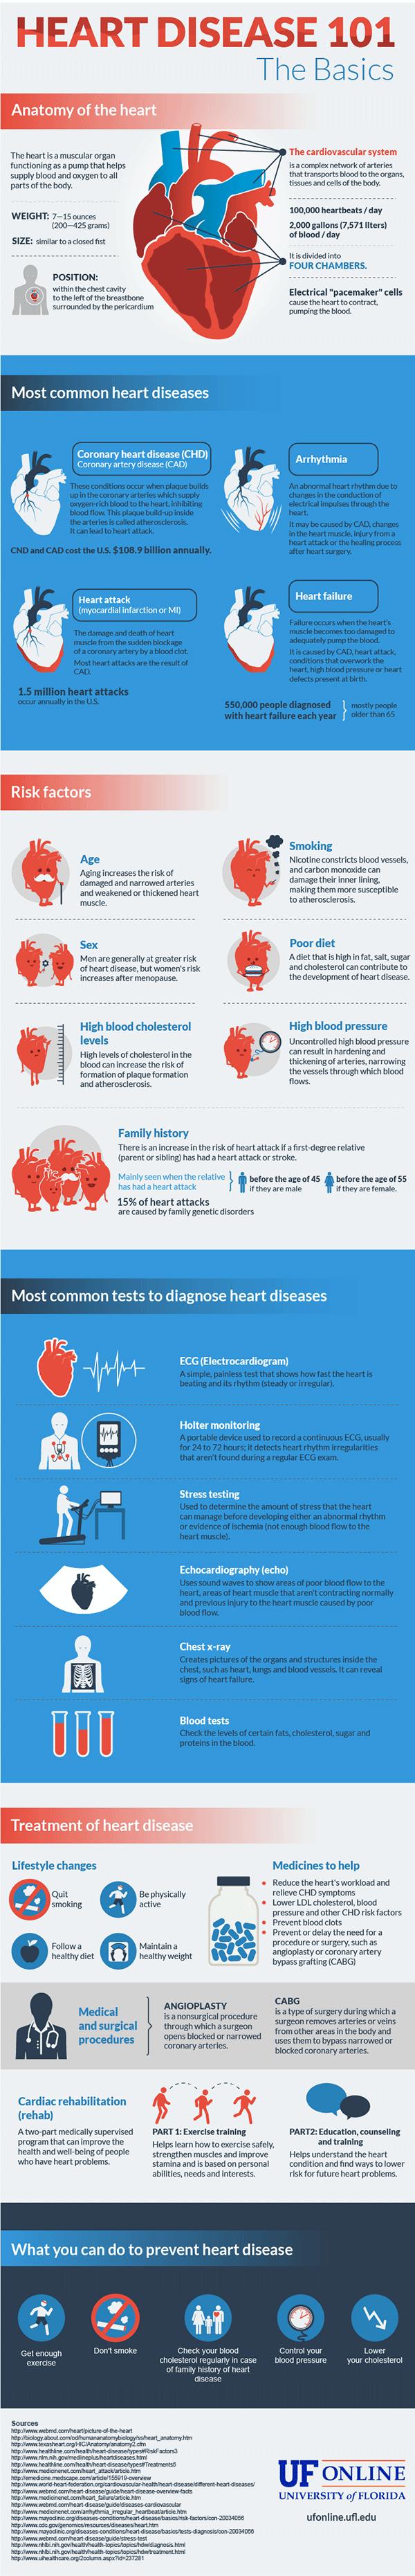 UF Online Infographic: Heart Disease 101: The Basics